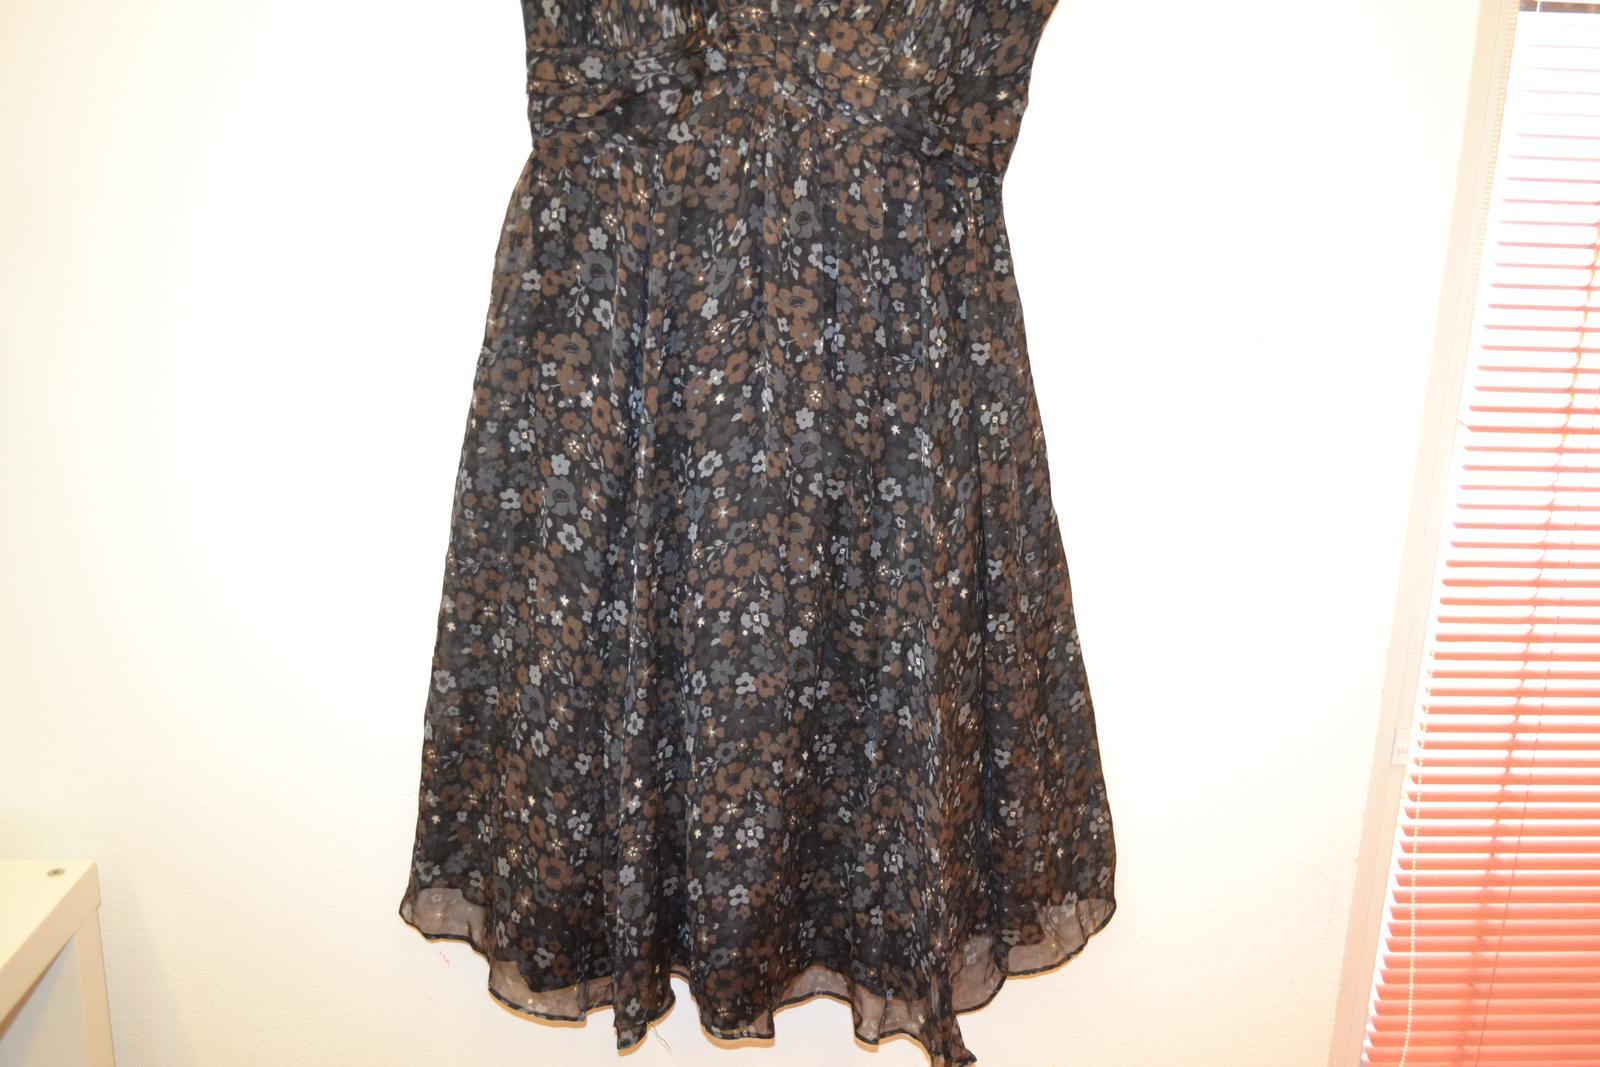 Hedvábné šaty zn. Zara top stav - Obrázek č. 4